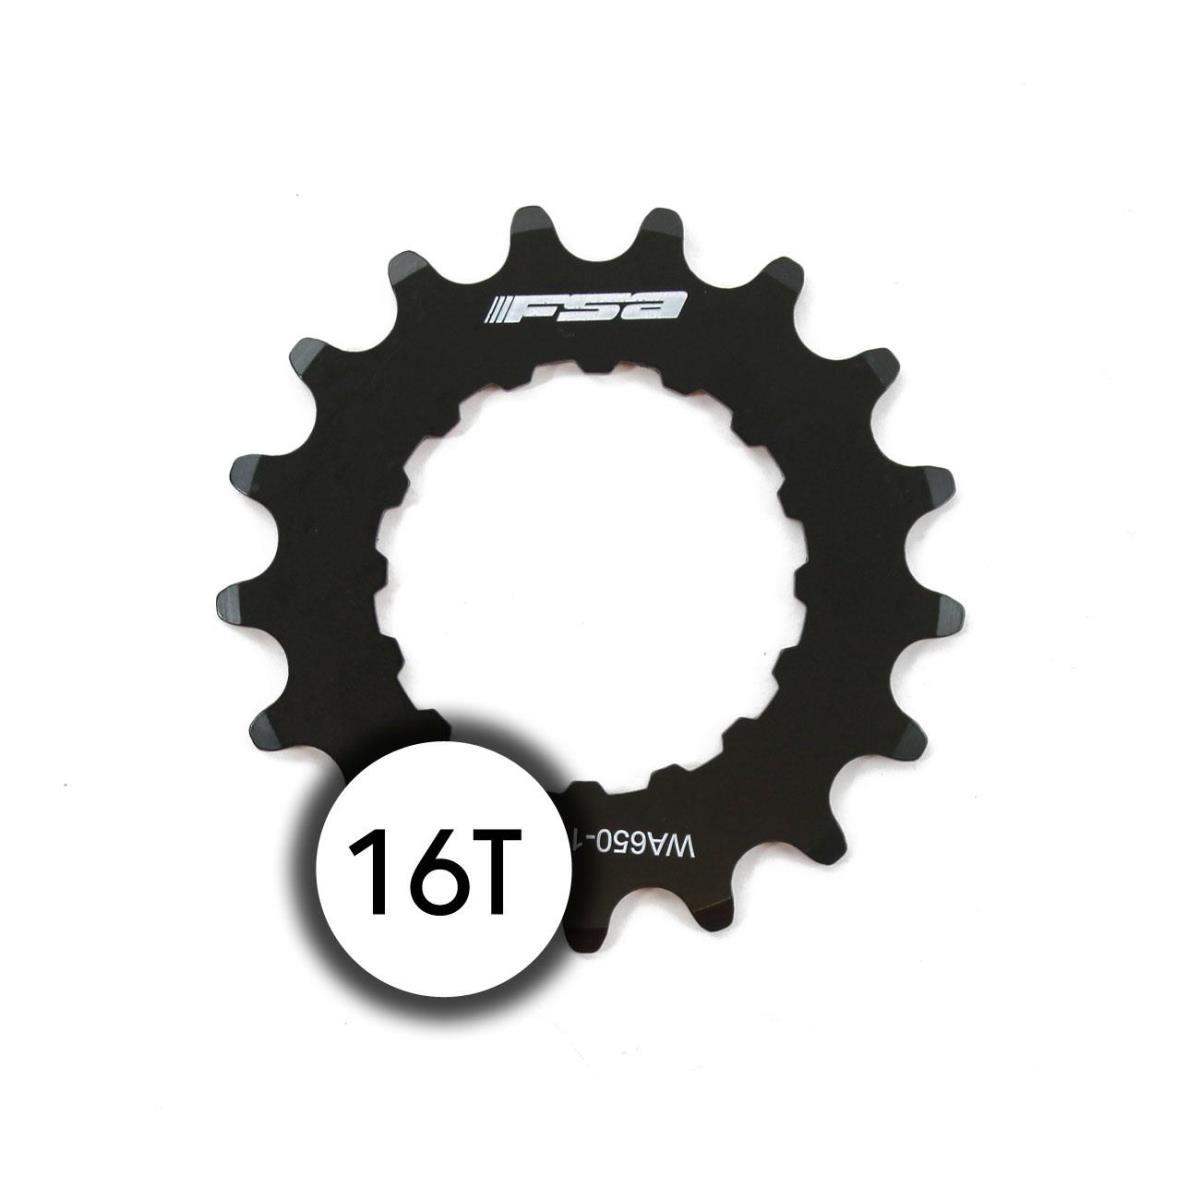 sprocket 16t bosch ebike chainring wa649 stainless steel black